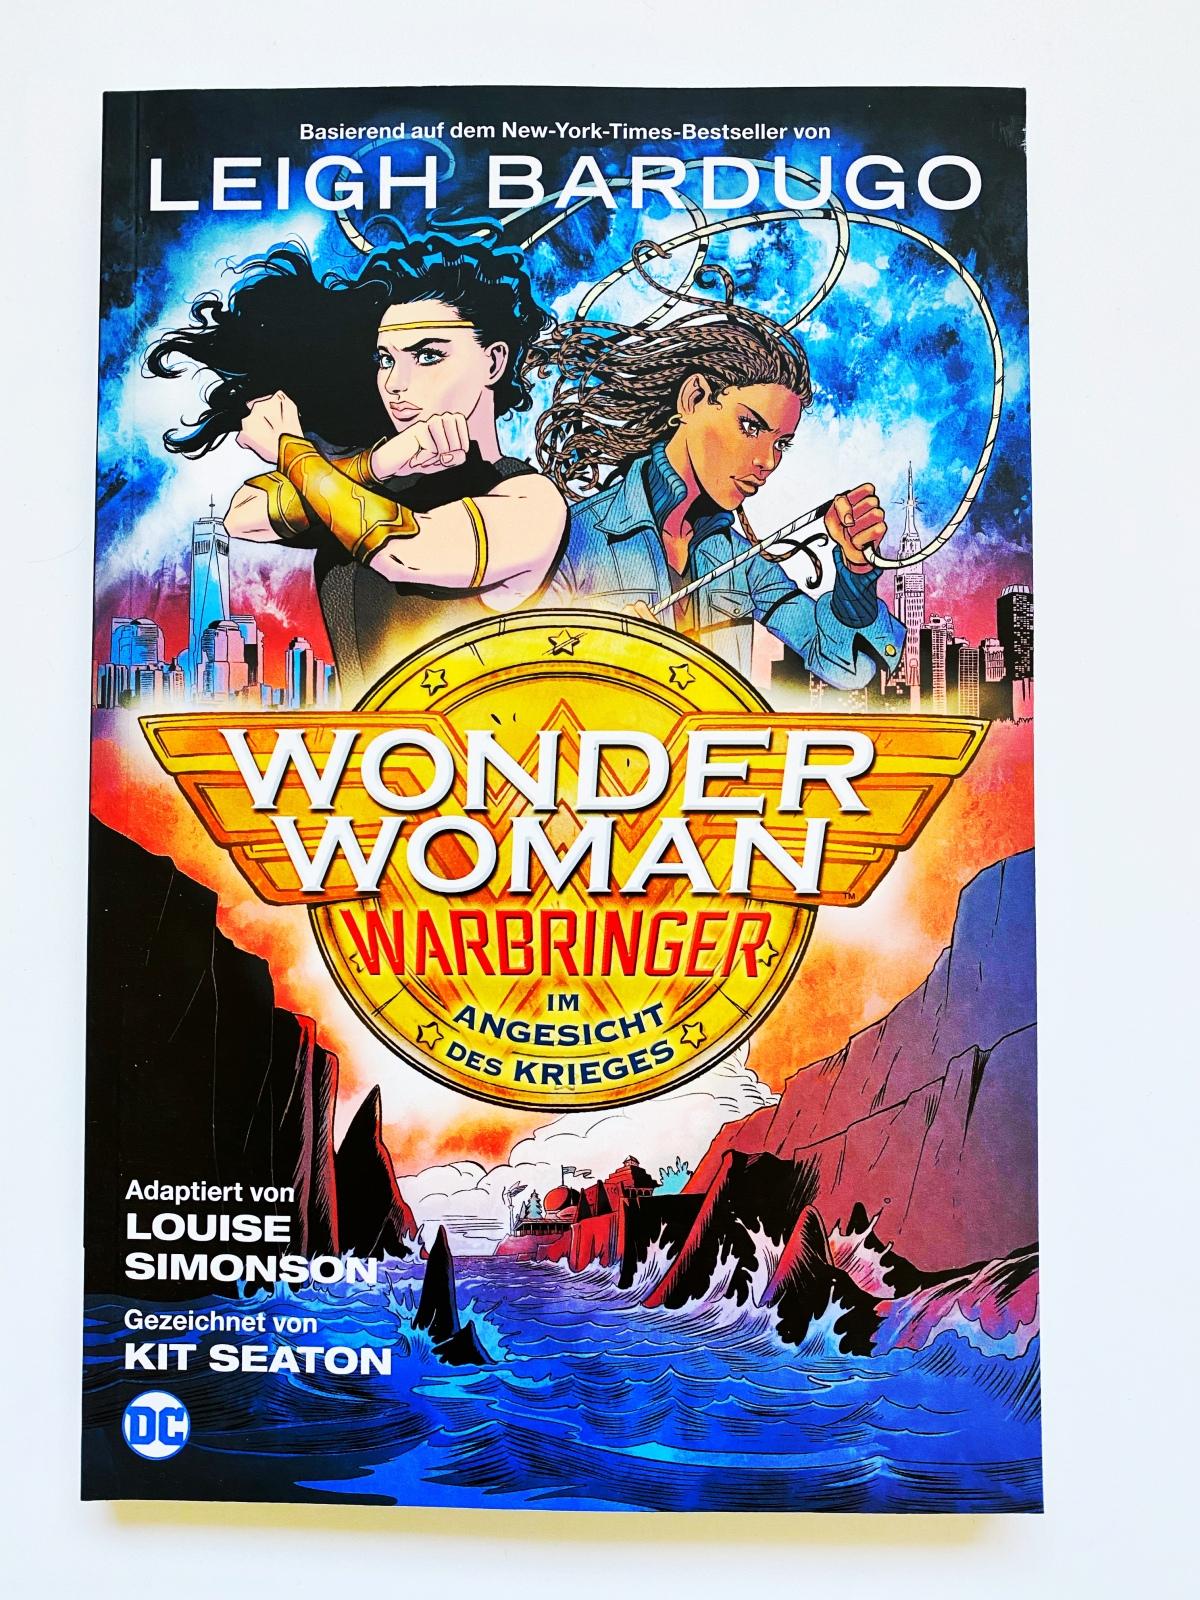 Wonder Woman: Warbringer – Im Angesicht des Krieges ⚔️ | Review [Rezensionsexemplar]